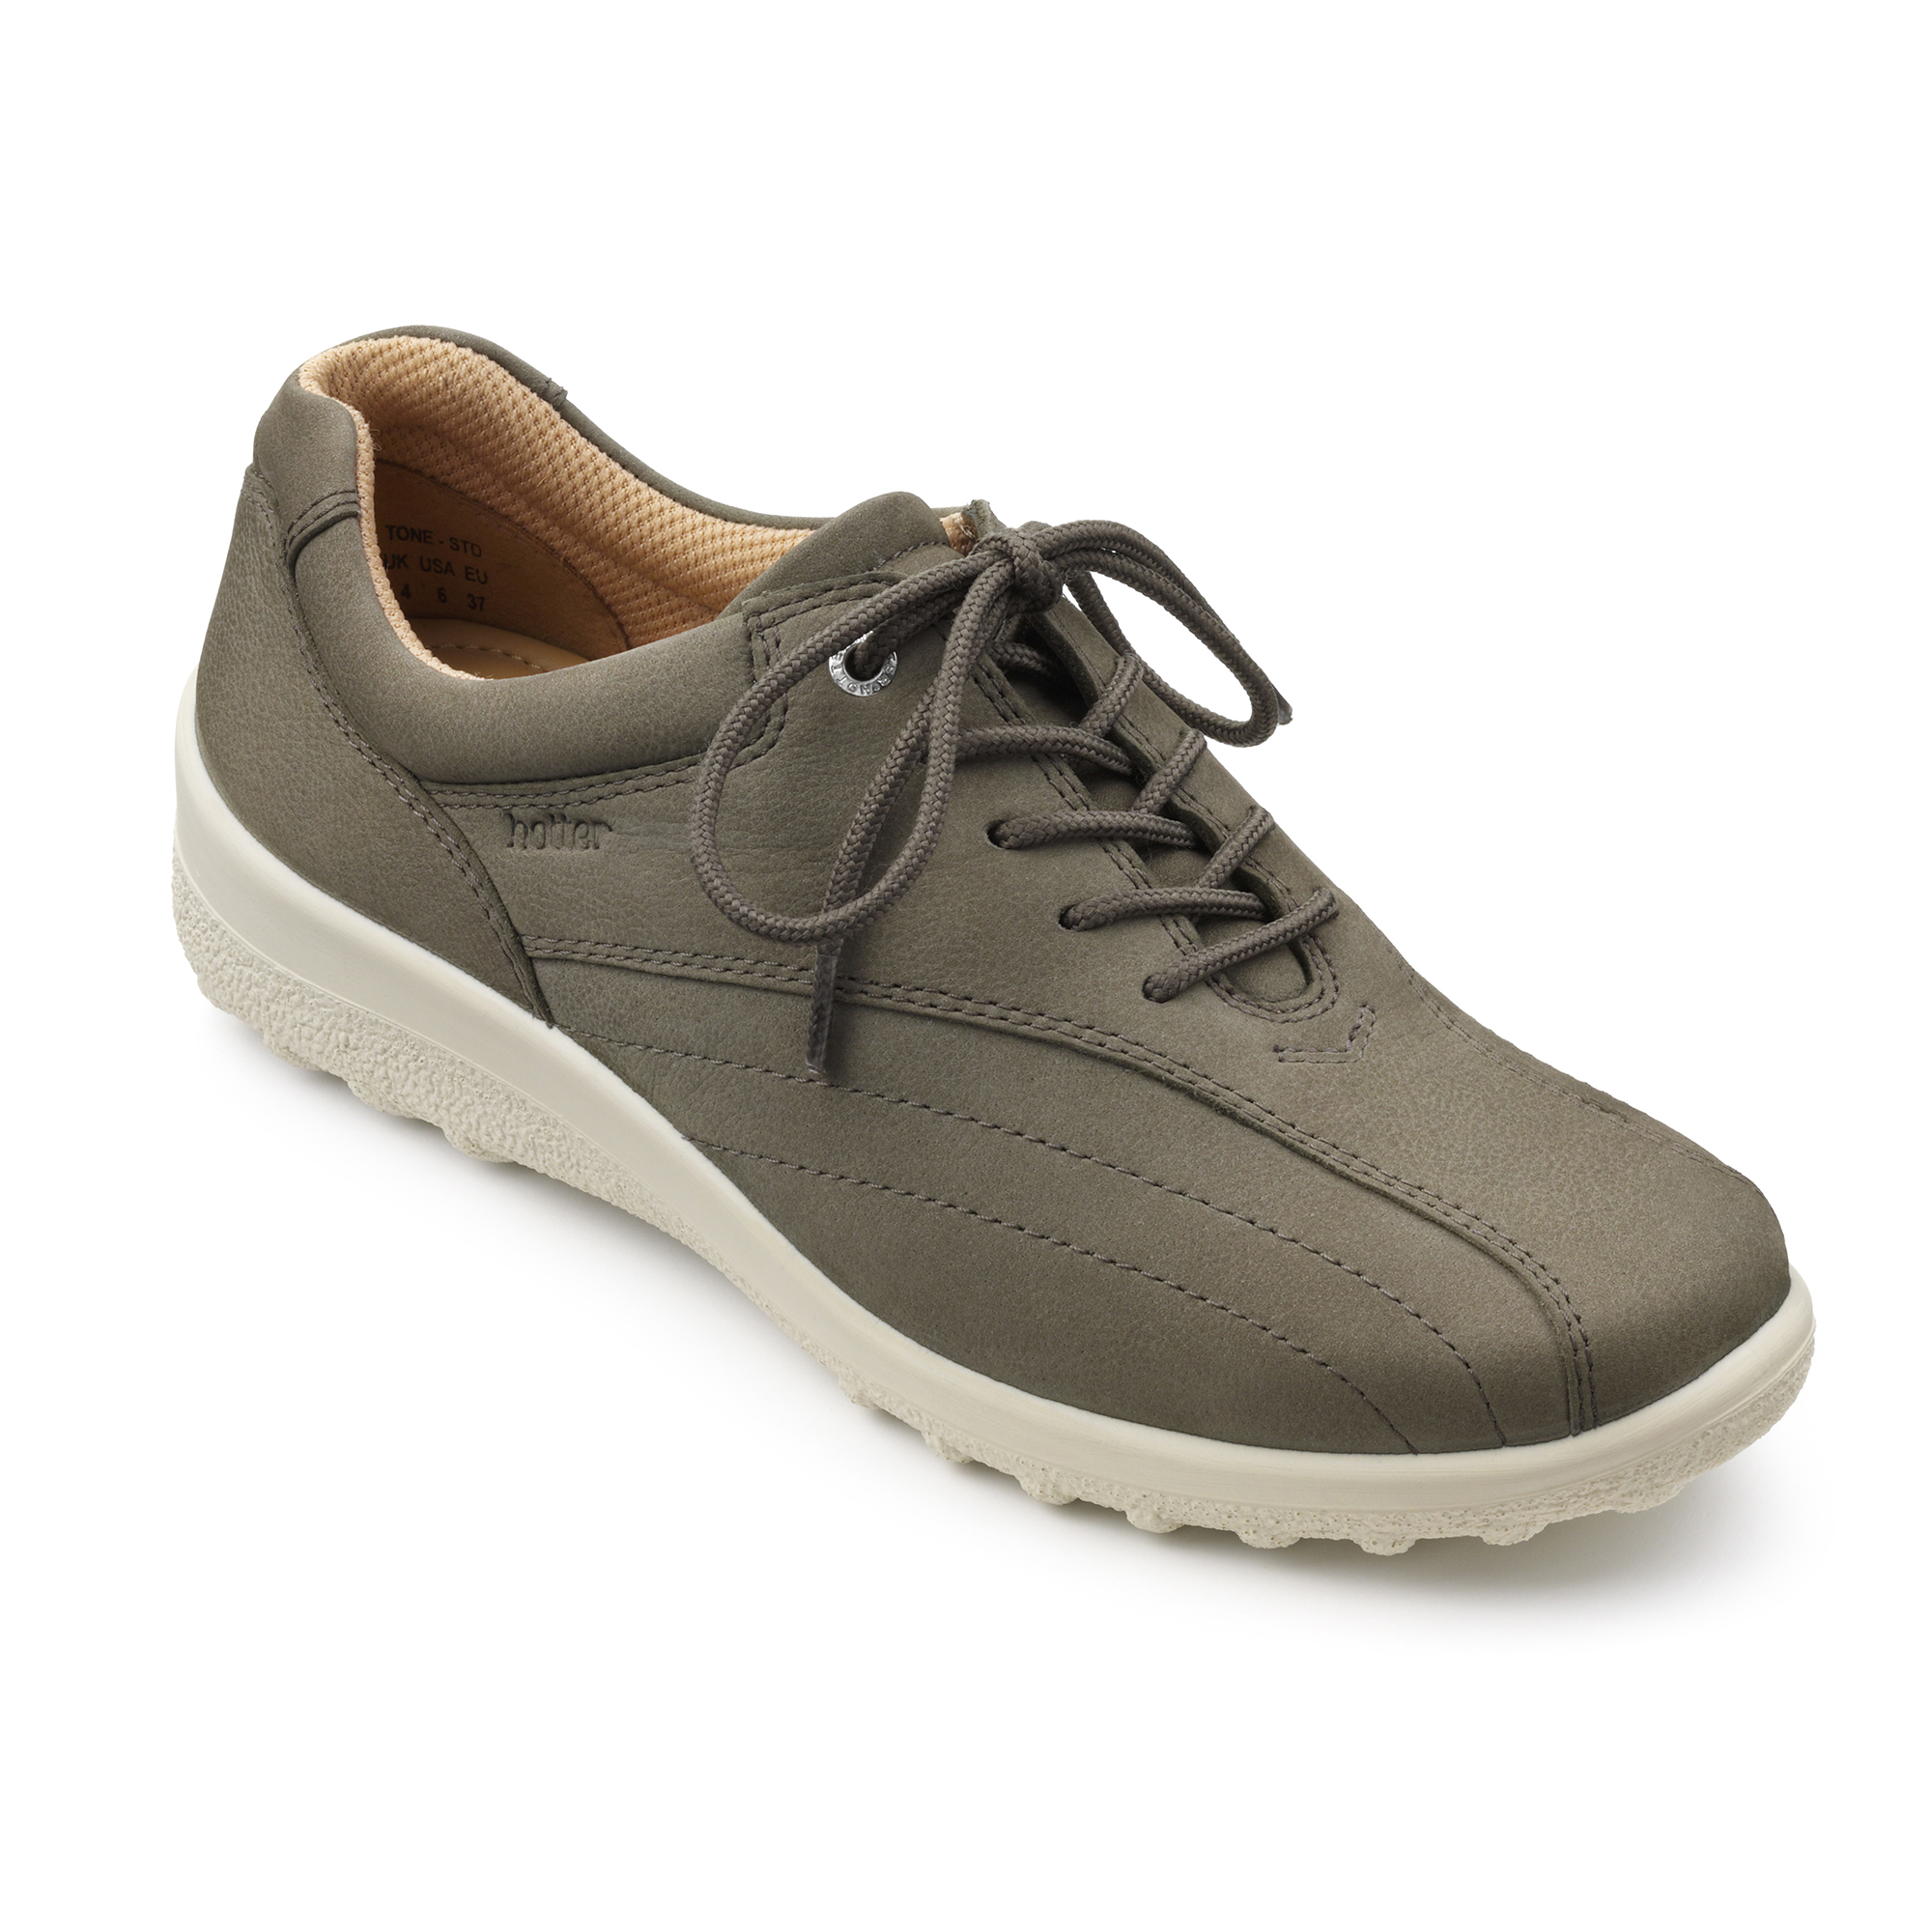 Hotter-Mujer-Tone-Senoras-Casual-Zapatos-Calzado-Zapatillas-Cuero-Textil